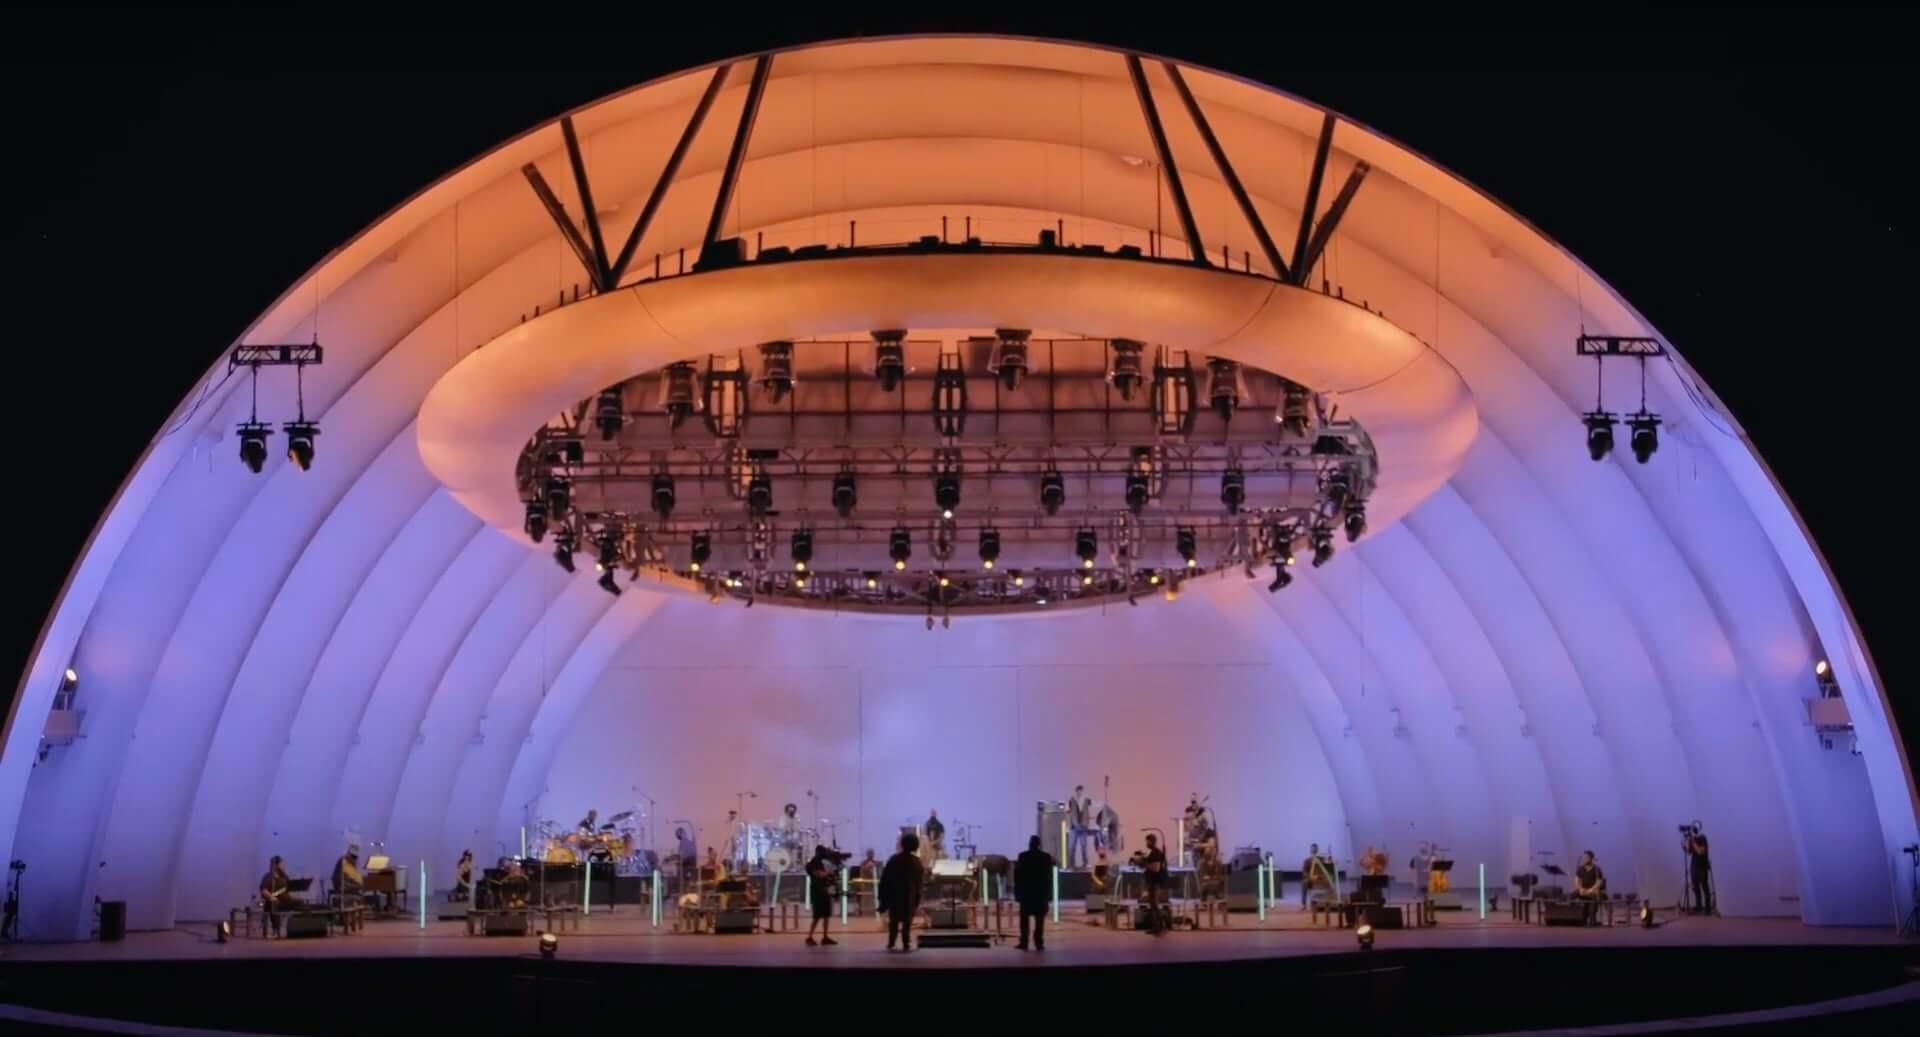 Kamasi Washingtonによる映画音楽作品『Becoming』のライブ映像を映画館で!オリジナル・スコアの演奏を楽しめる上映イベントが渋谷で開催決定 music210330_kamasi-washington_4-1920x1037